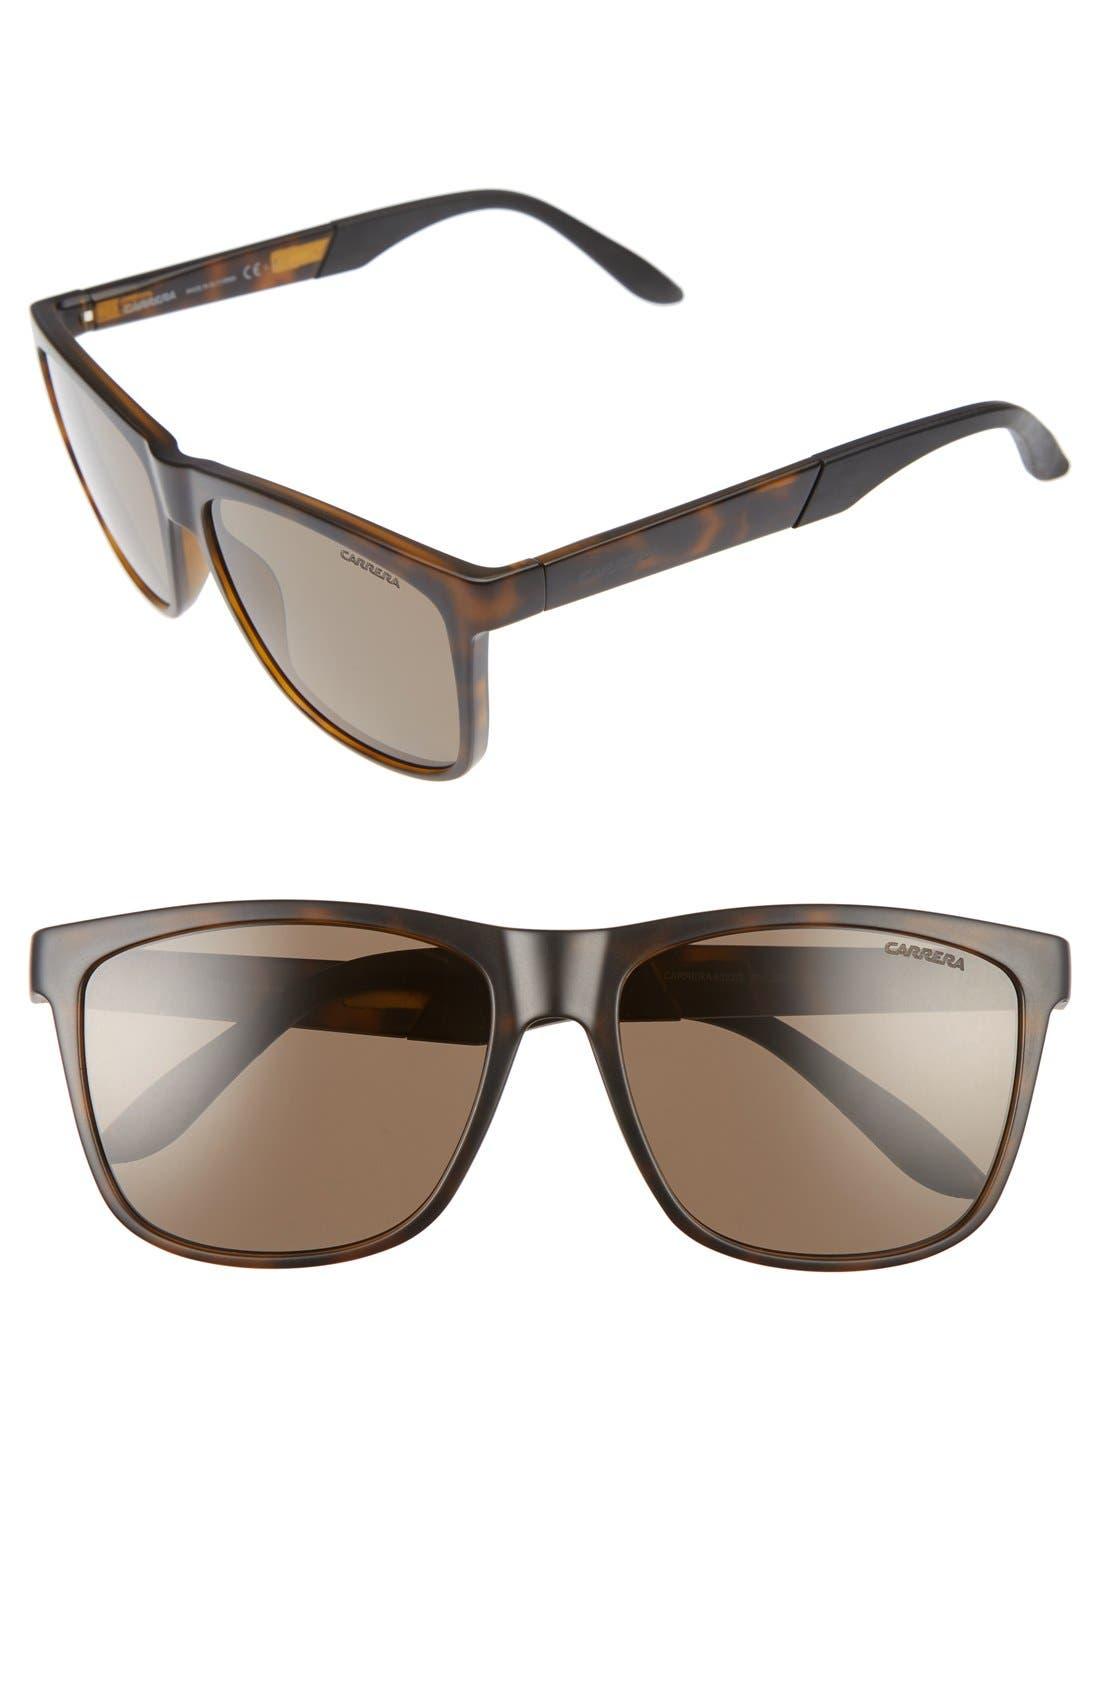 Main Image - Carrera Eyewear 8022/S 56mm Polarized Sunglasses